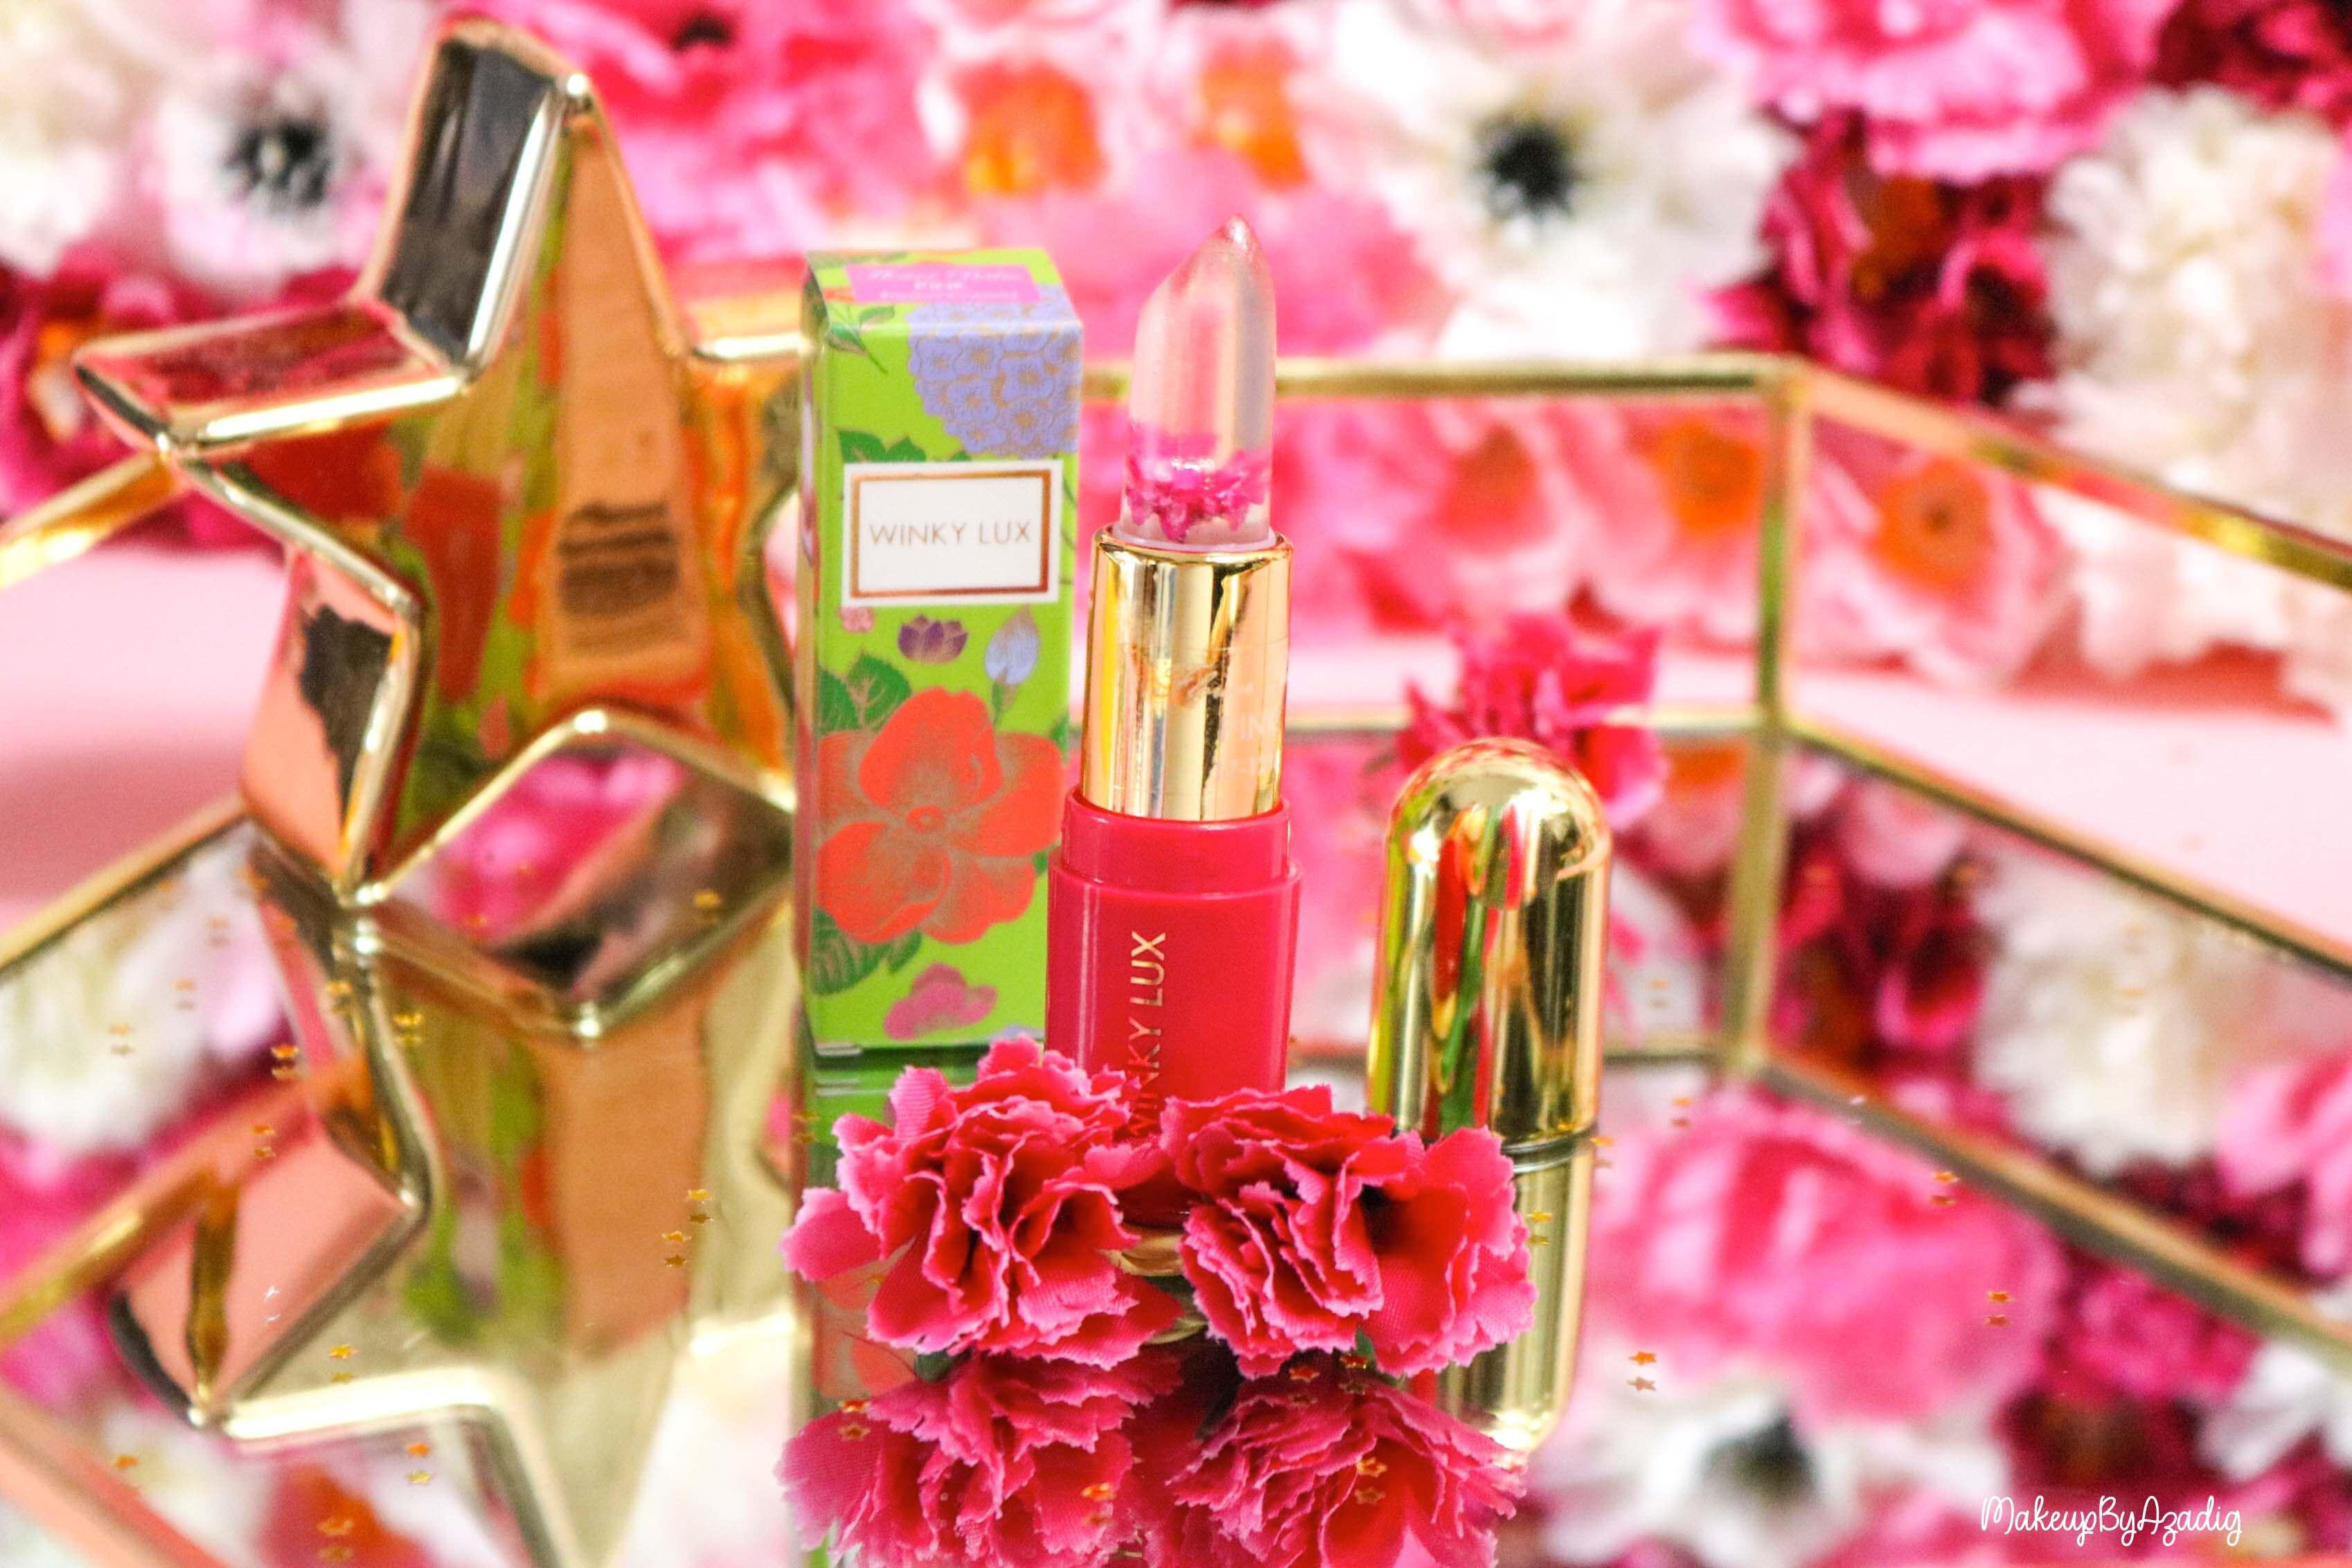 revue-flower-balm-baume-levres-winky-lux-sephora-rose-avis-prix-makeupbyazadig-gold